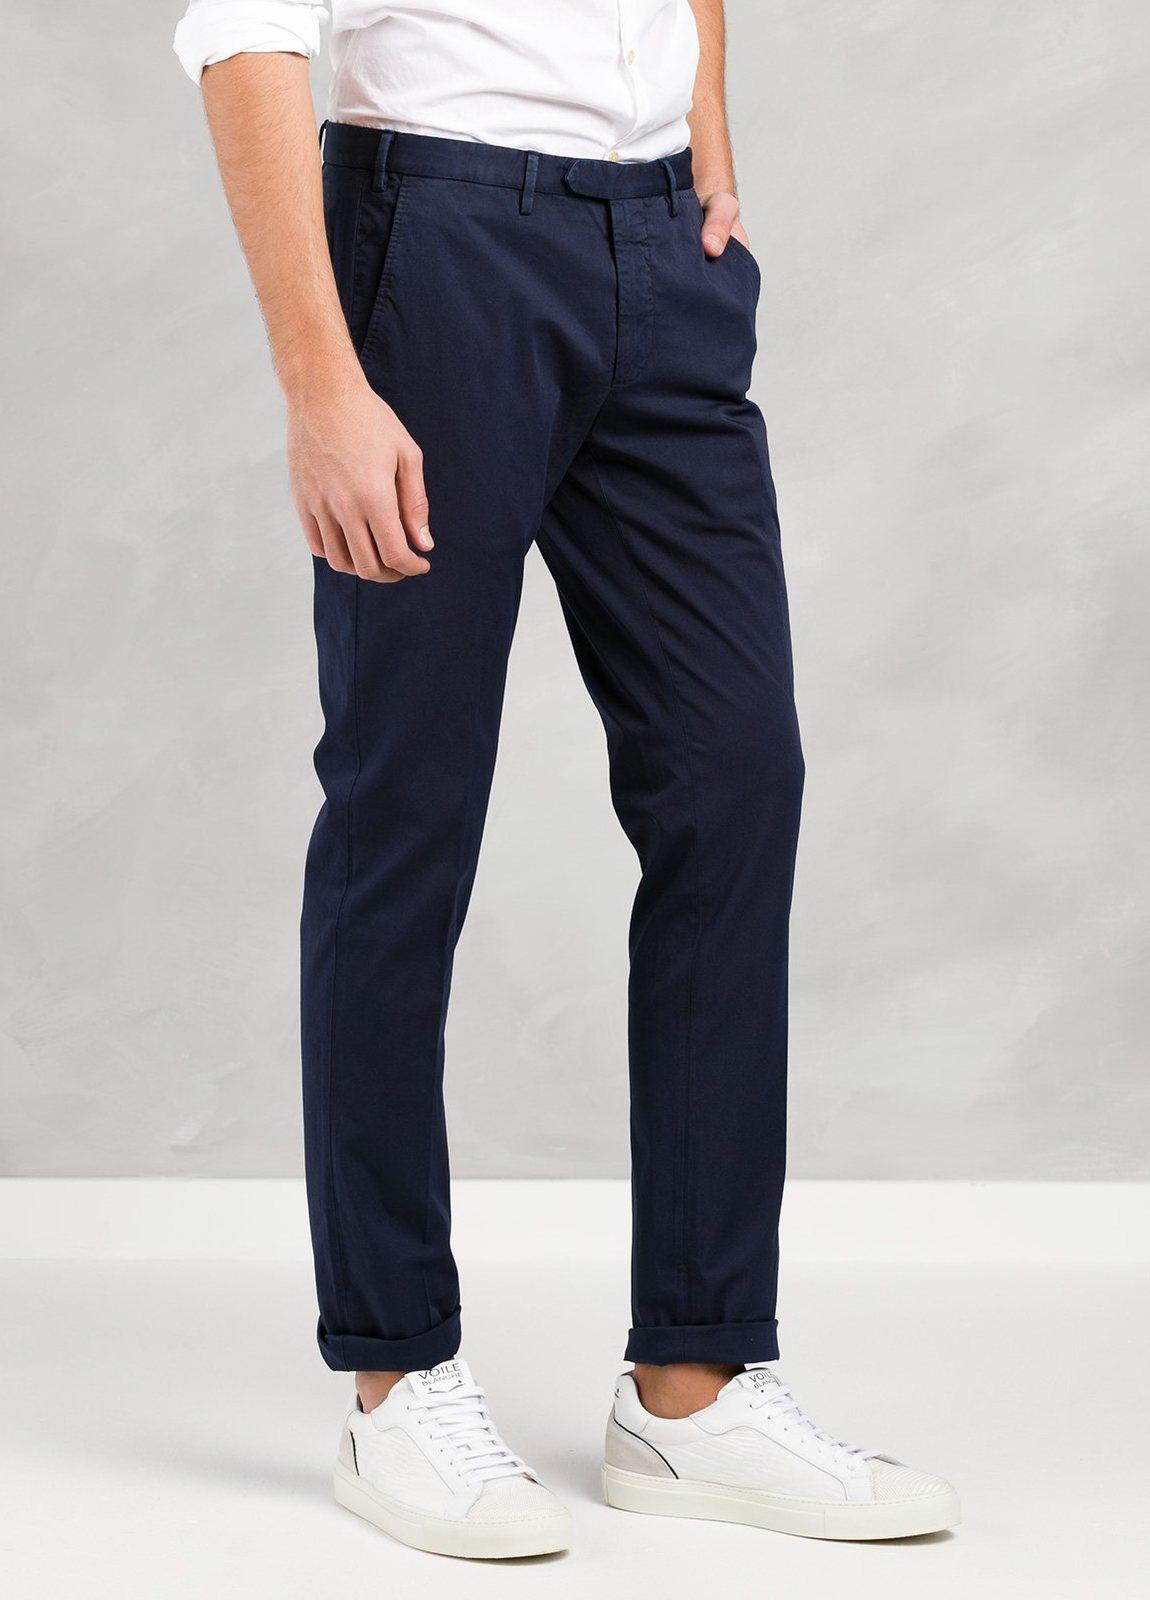 Pantalón chino modelo BWWT color azul marino, algodón gabardina delavada. - Ítem1